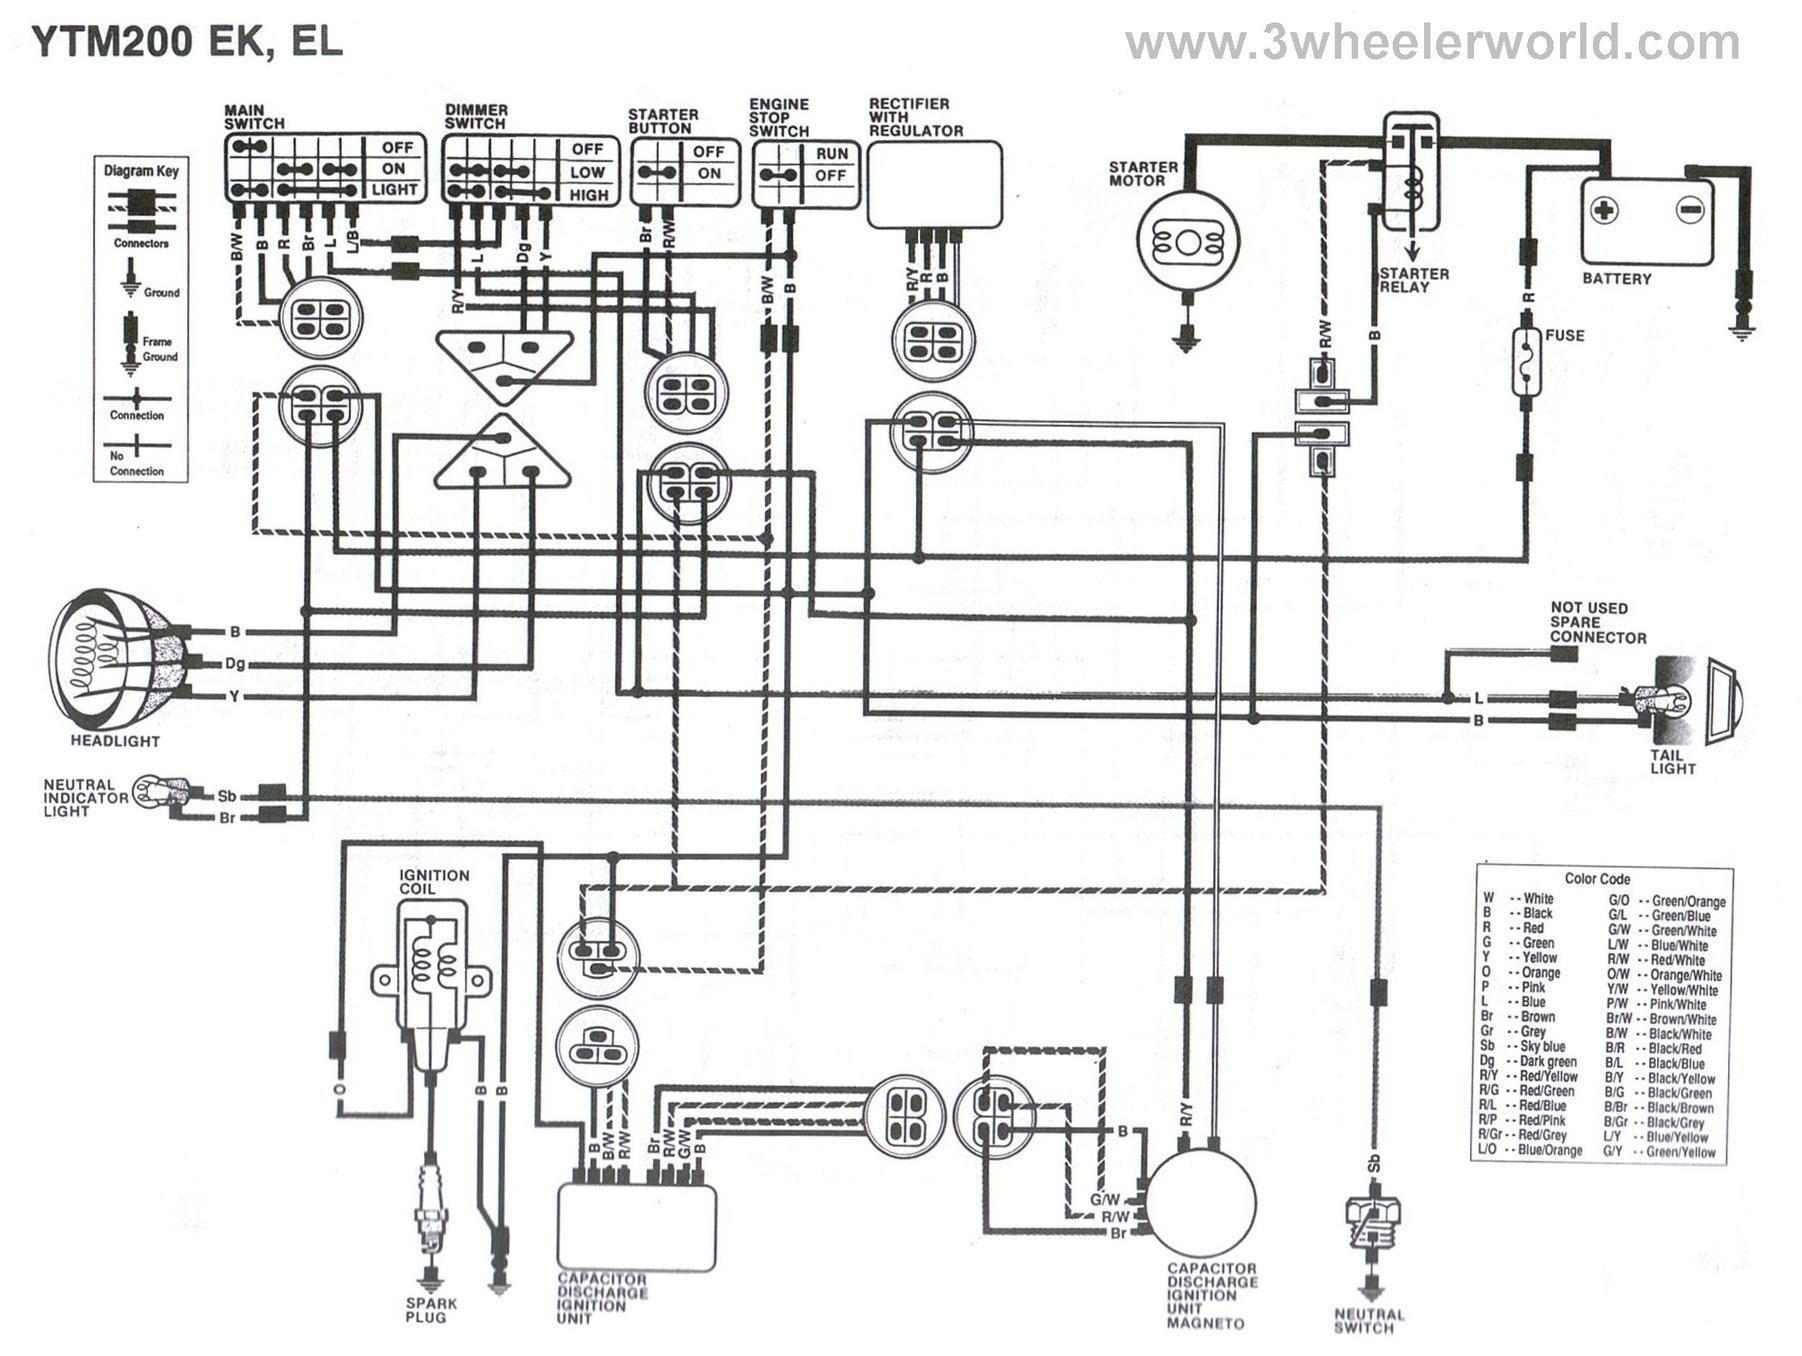 Yamaha Blaster Wiring Diagram Awesome Stock Diagrams Stuning - Yamaha Blaster Wiring Diagram